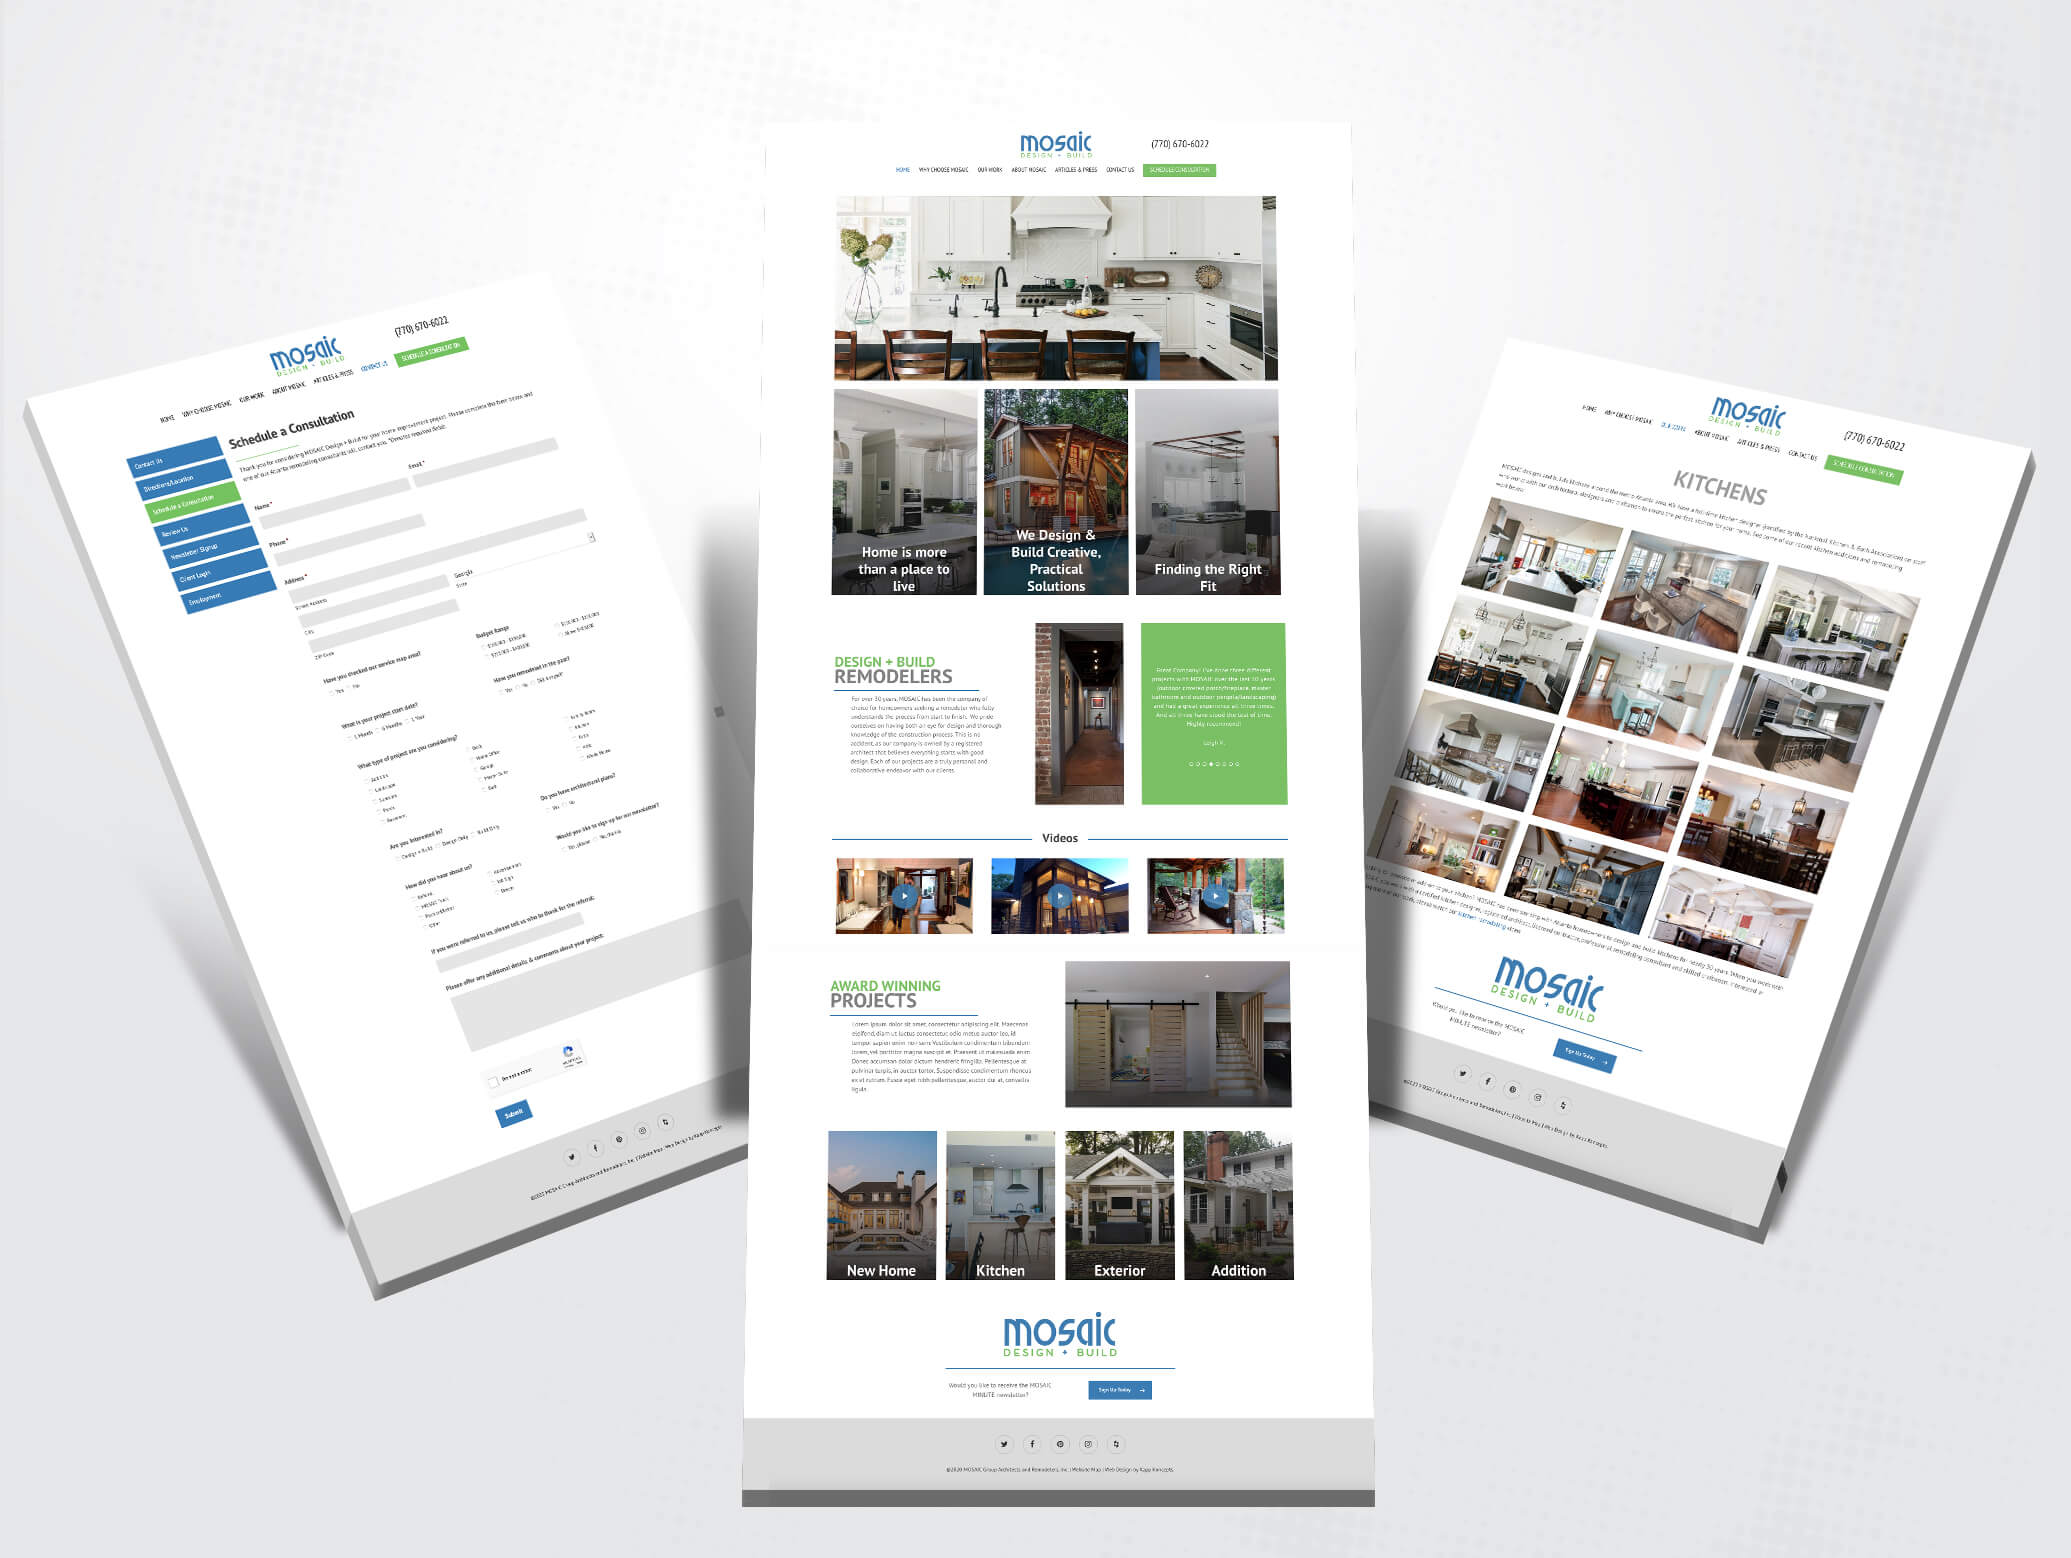 mosaic design + build website design images